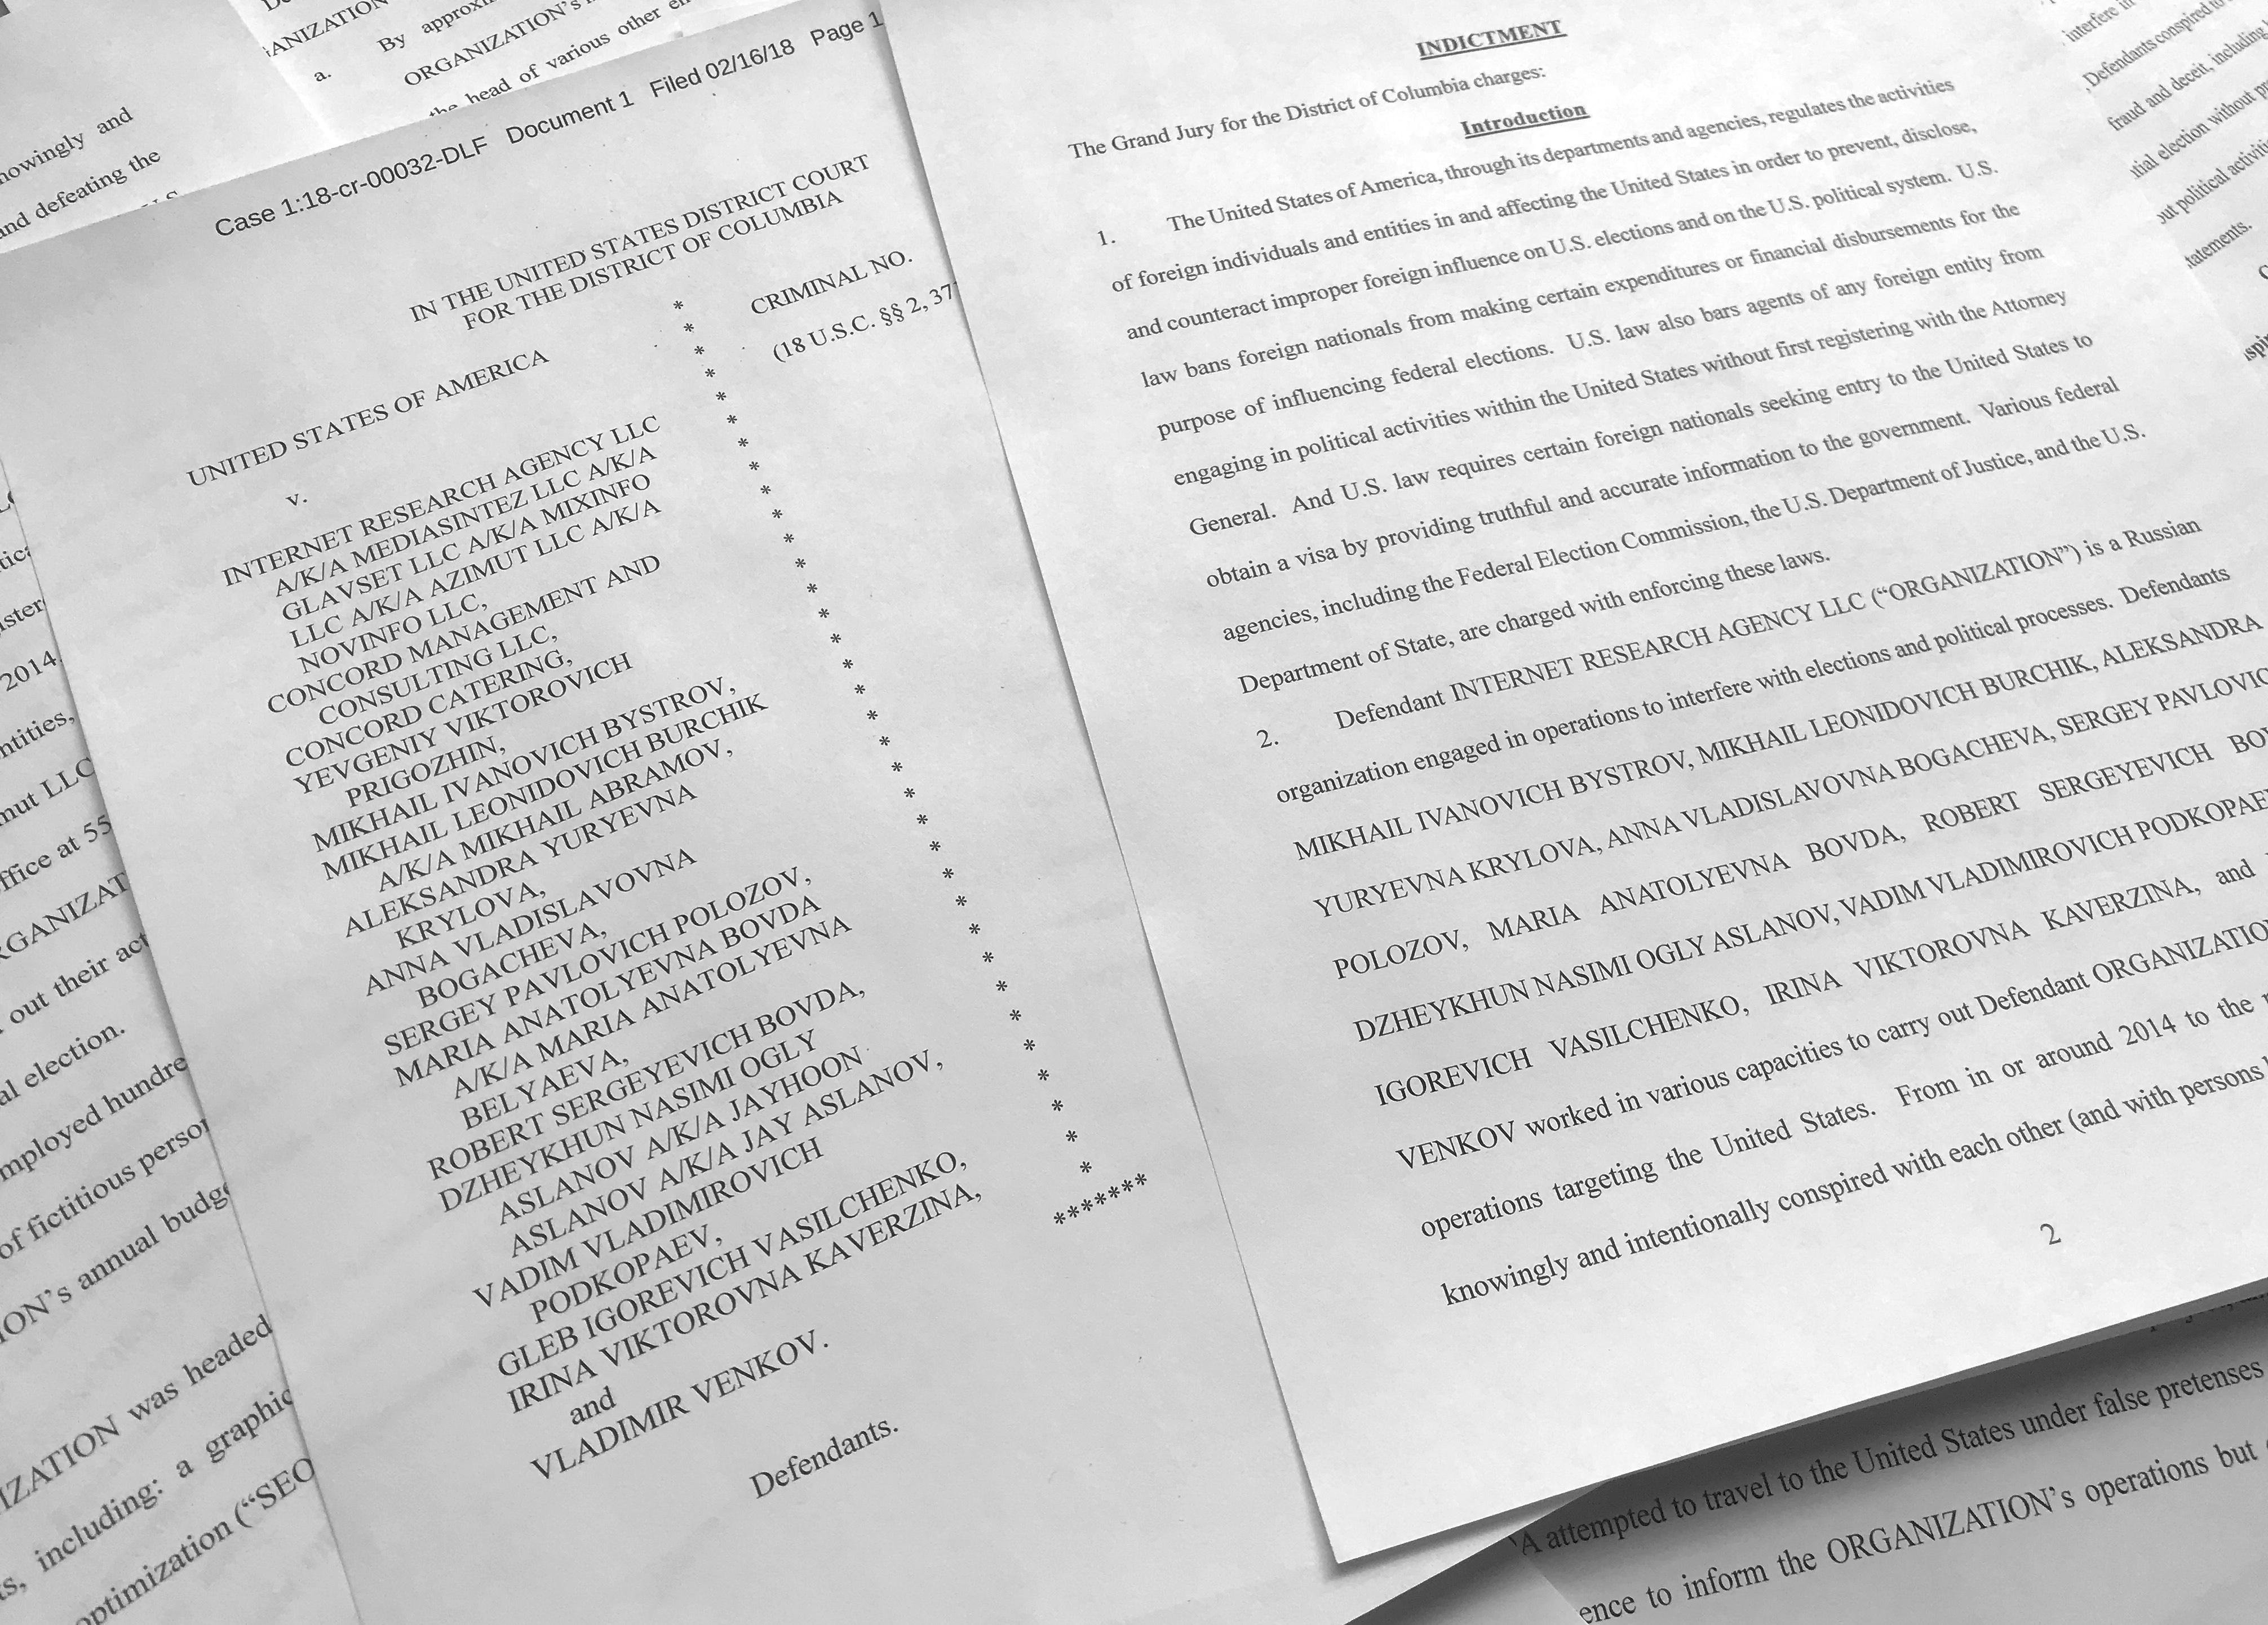 Trial in Russian troll farm case set for April 2020